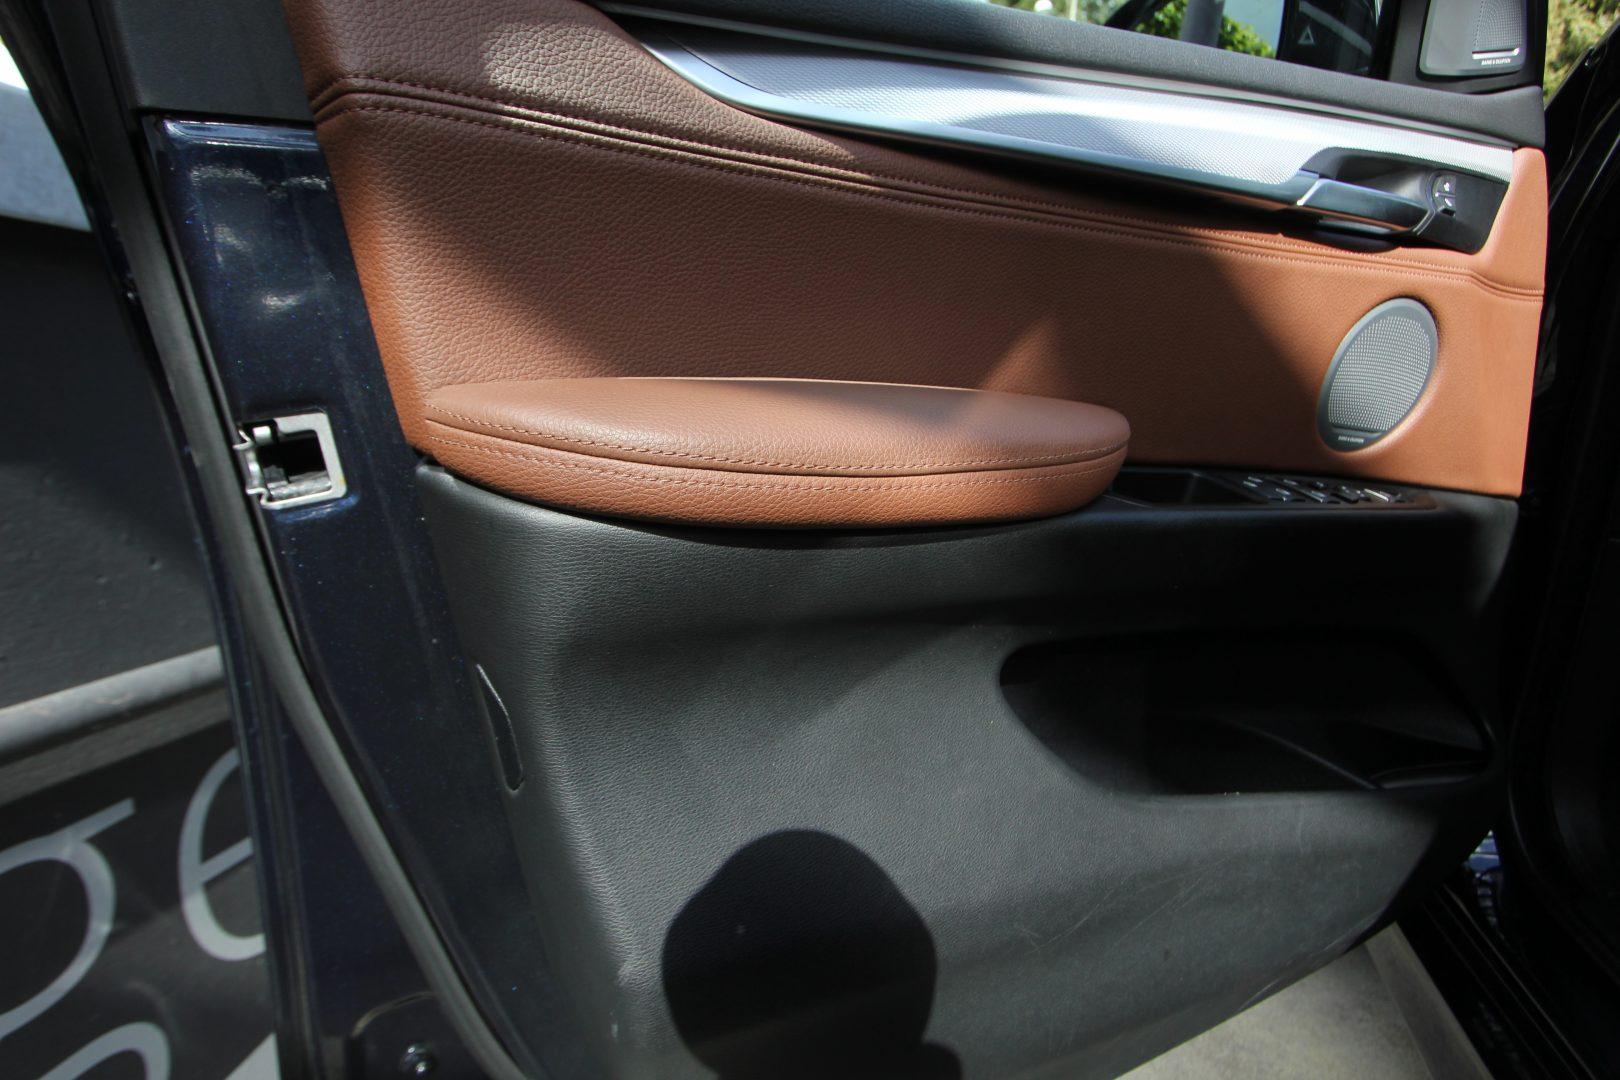 AIL BMW X5 M50d Bang & Olufsen Panorama RSE 8